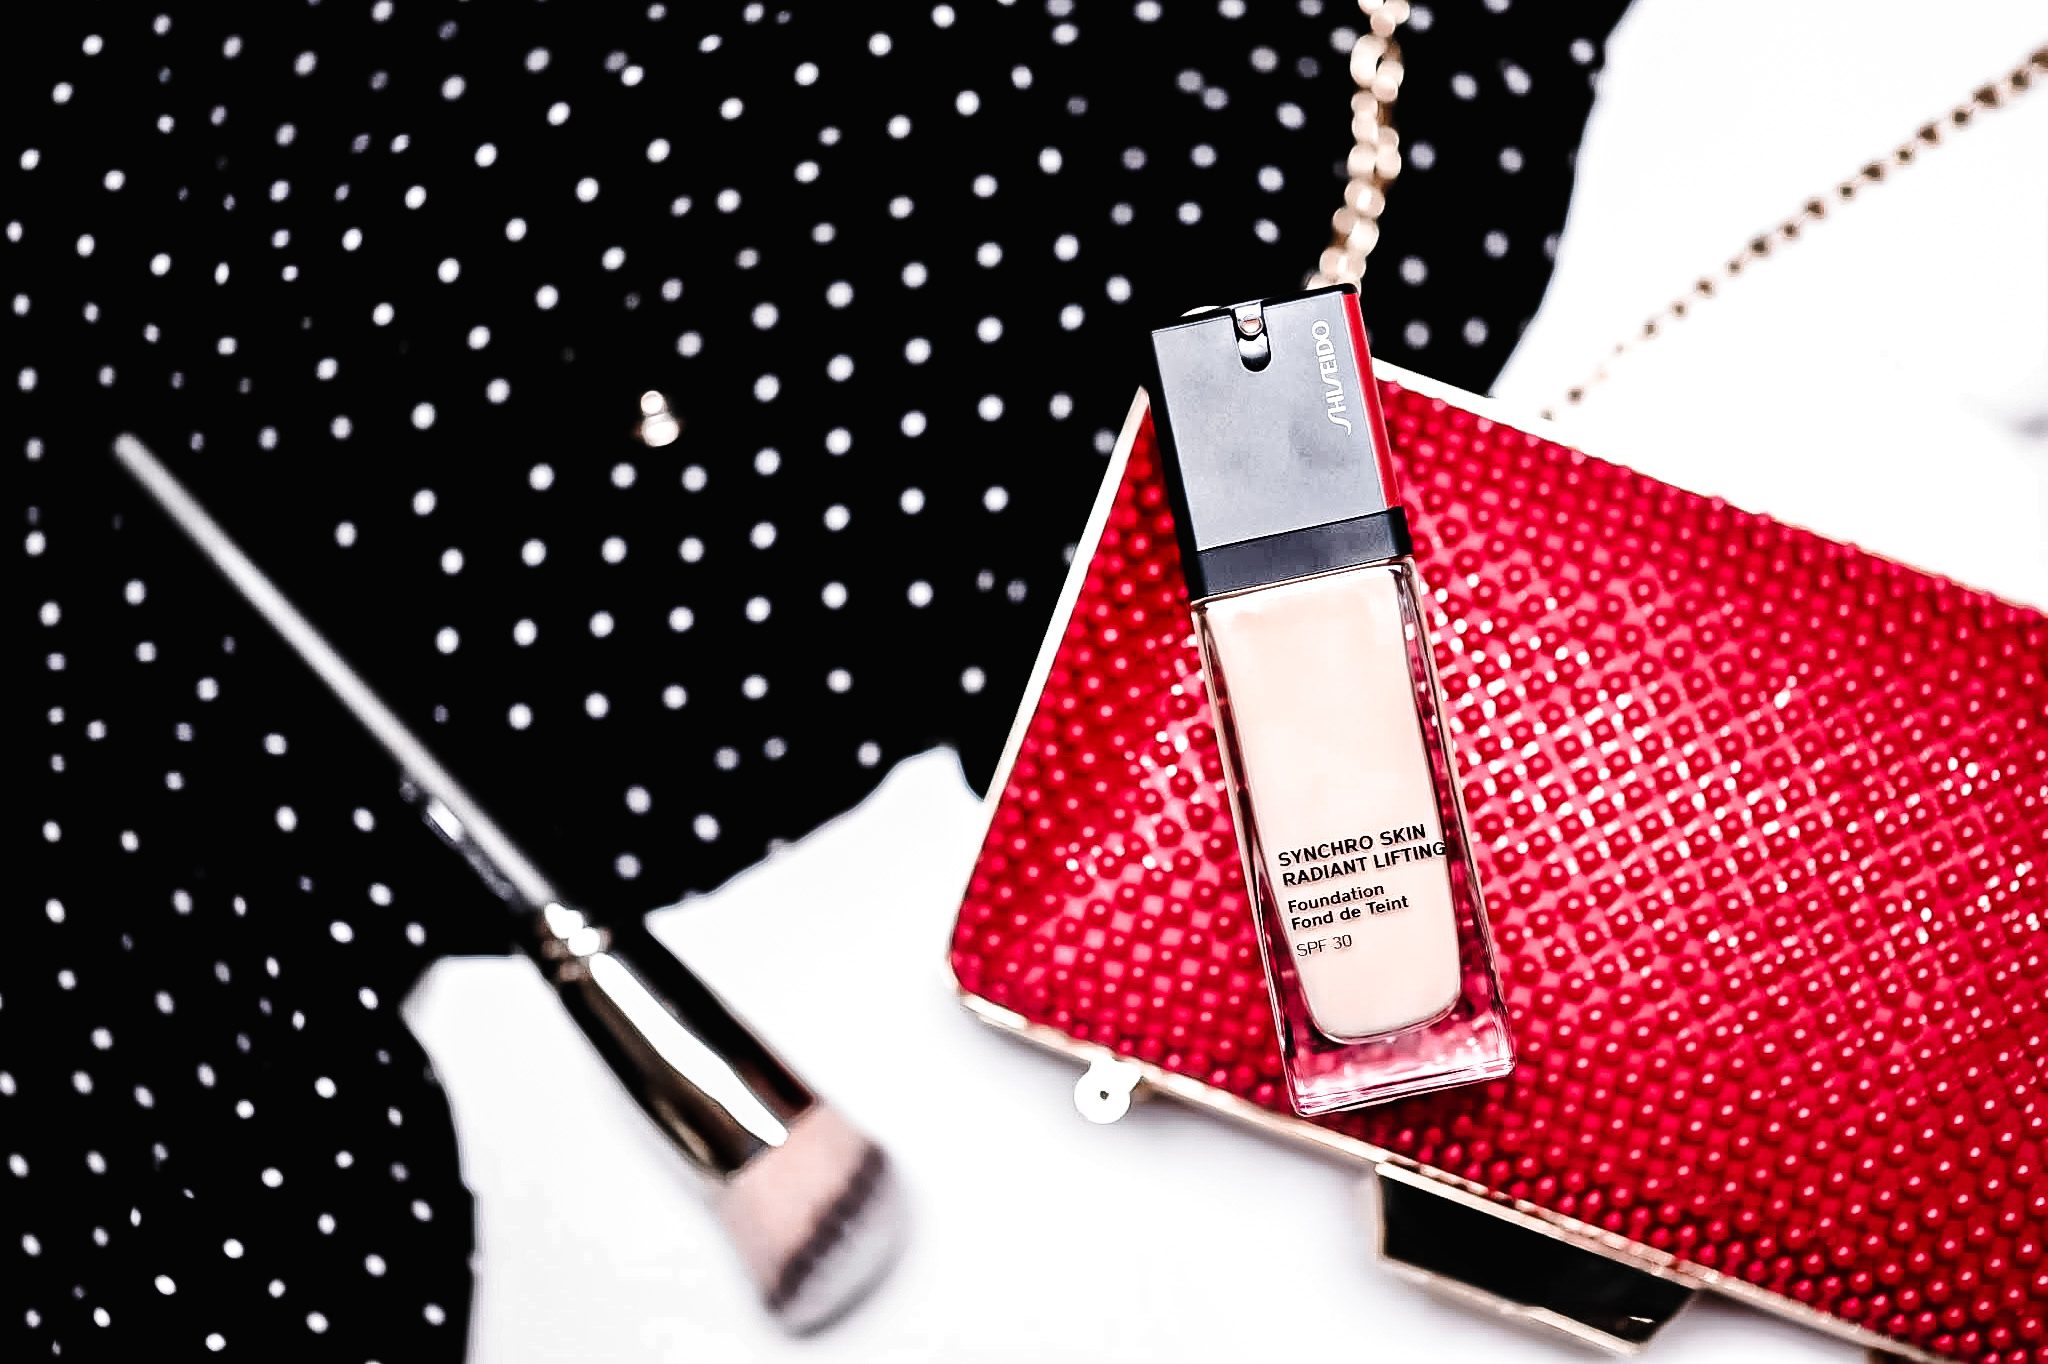 Shiseido Synchro Skin Radiant Lifting Font de Teint